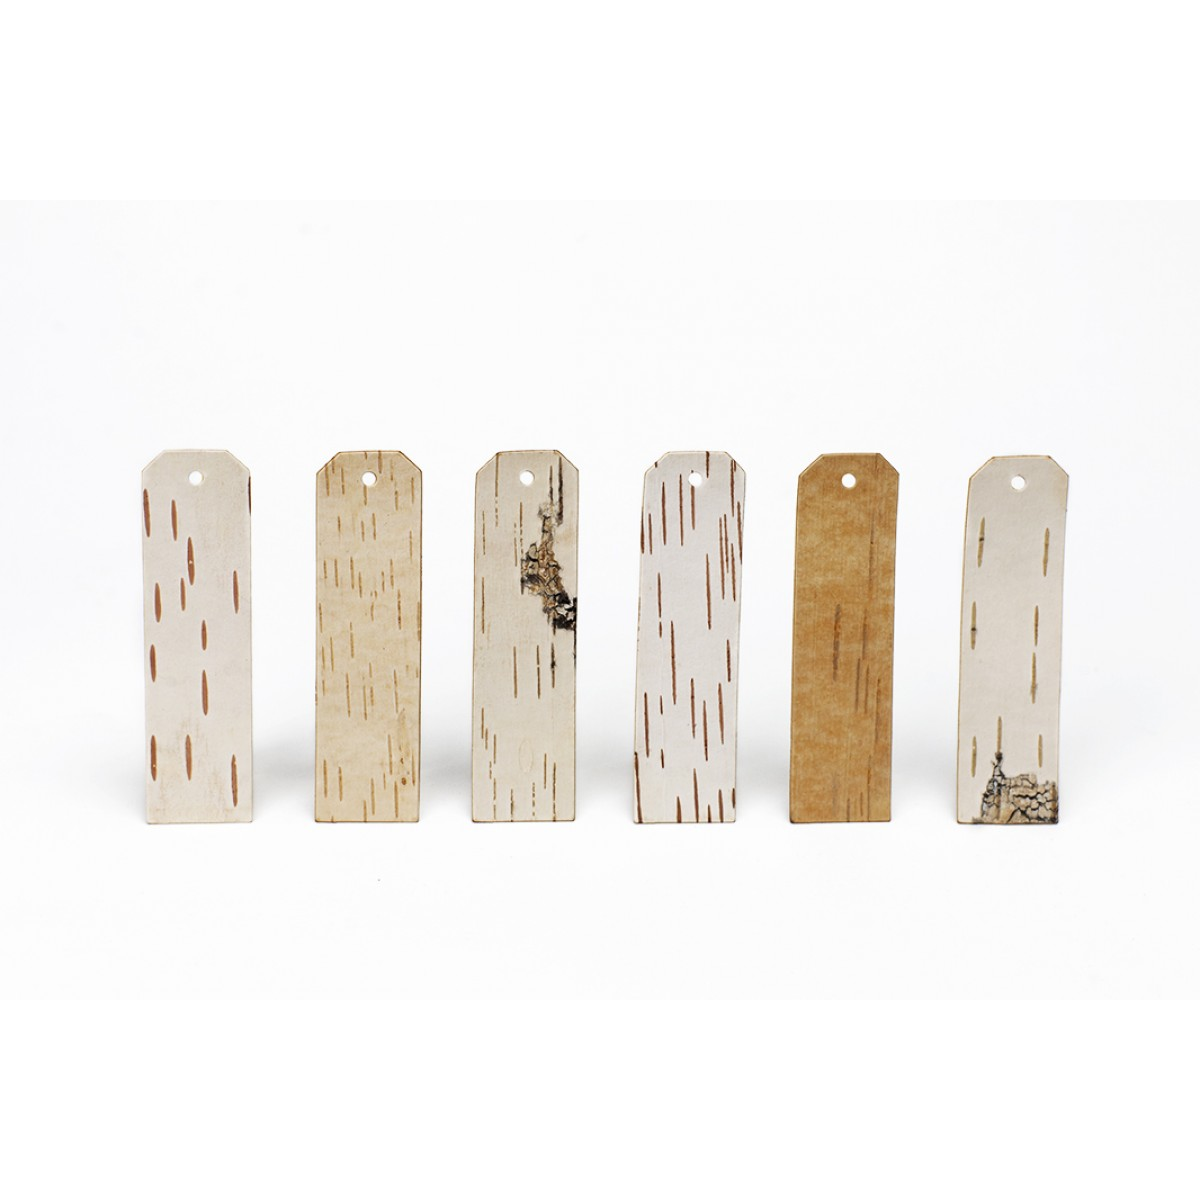 Geschenkanhänger aus beschreibbarer Birkenrinde - LANG - 6 Stück